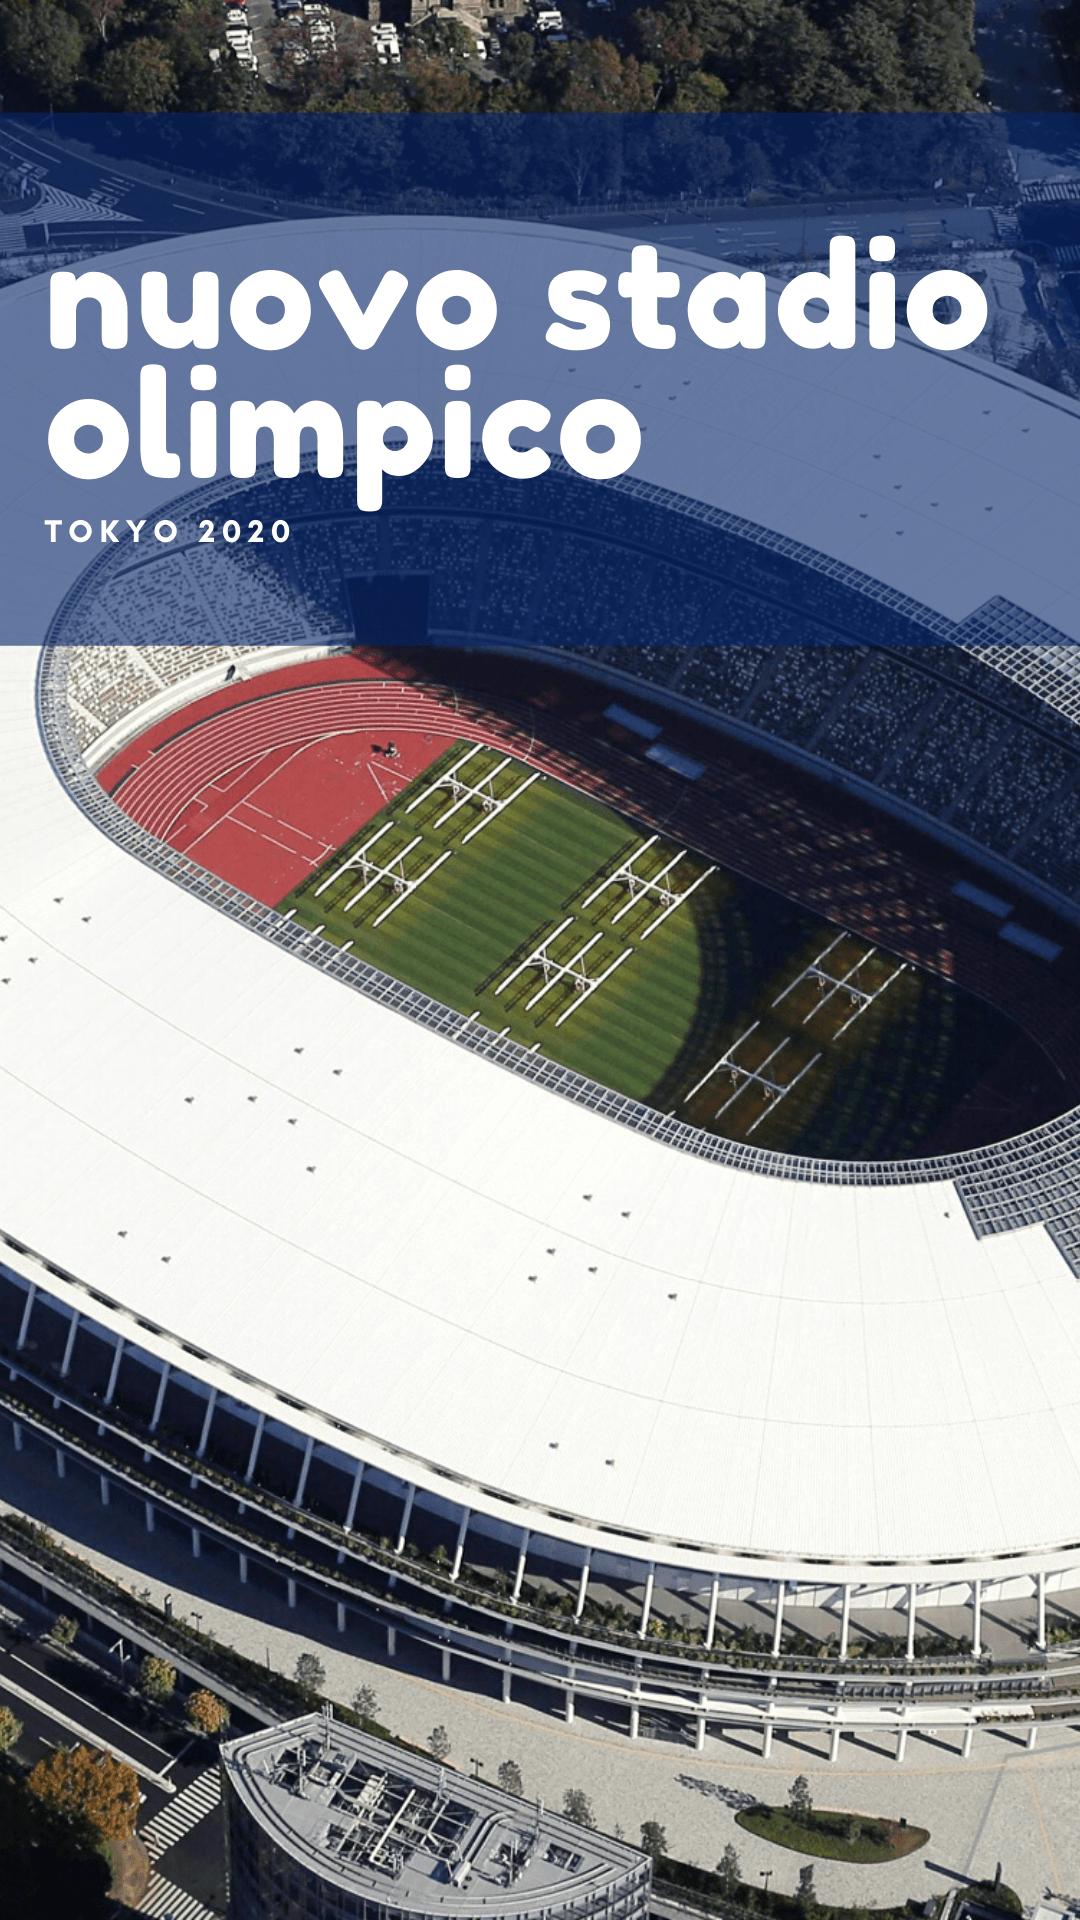 nuovo stadio olimpico tokyo 2020